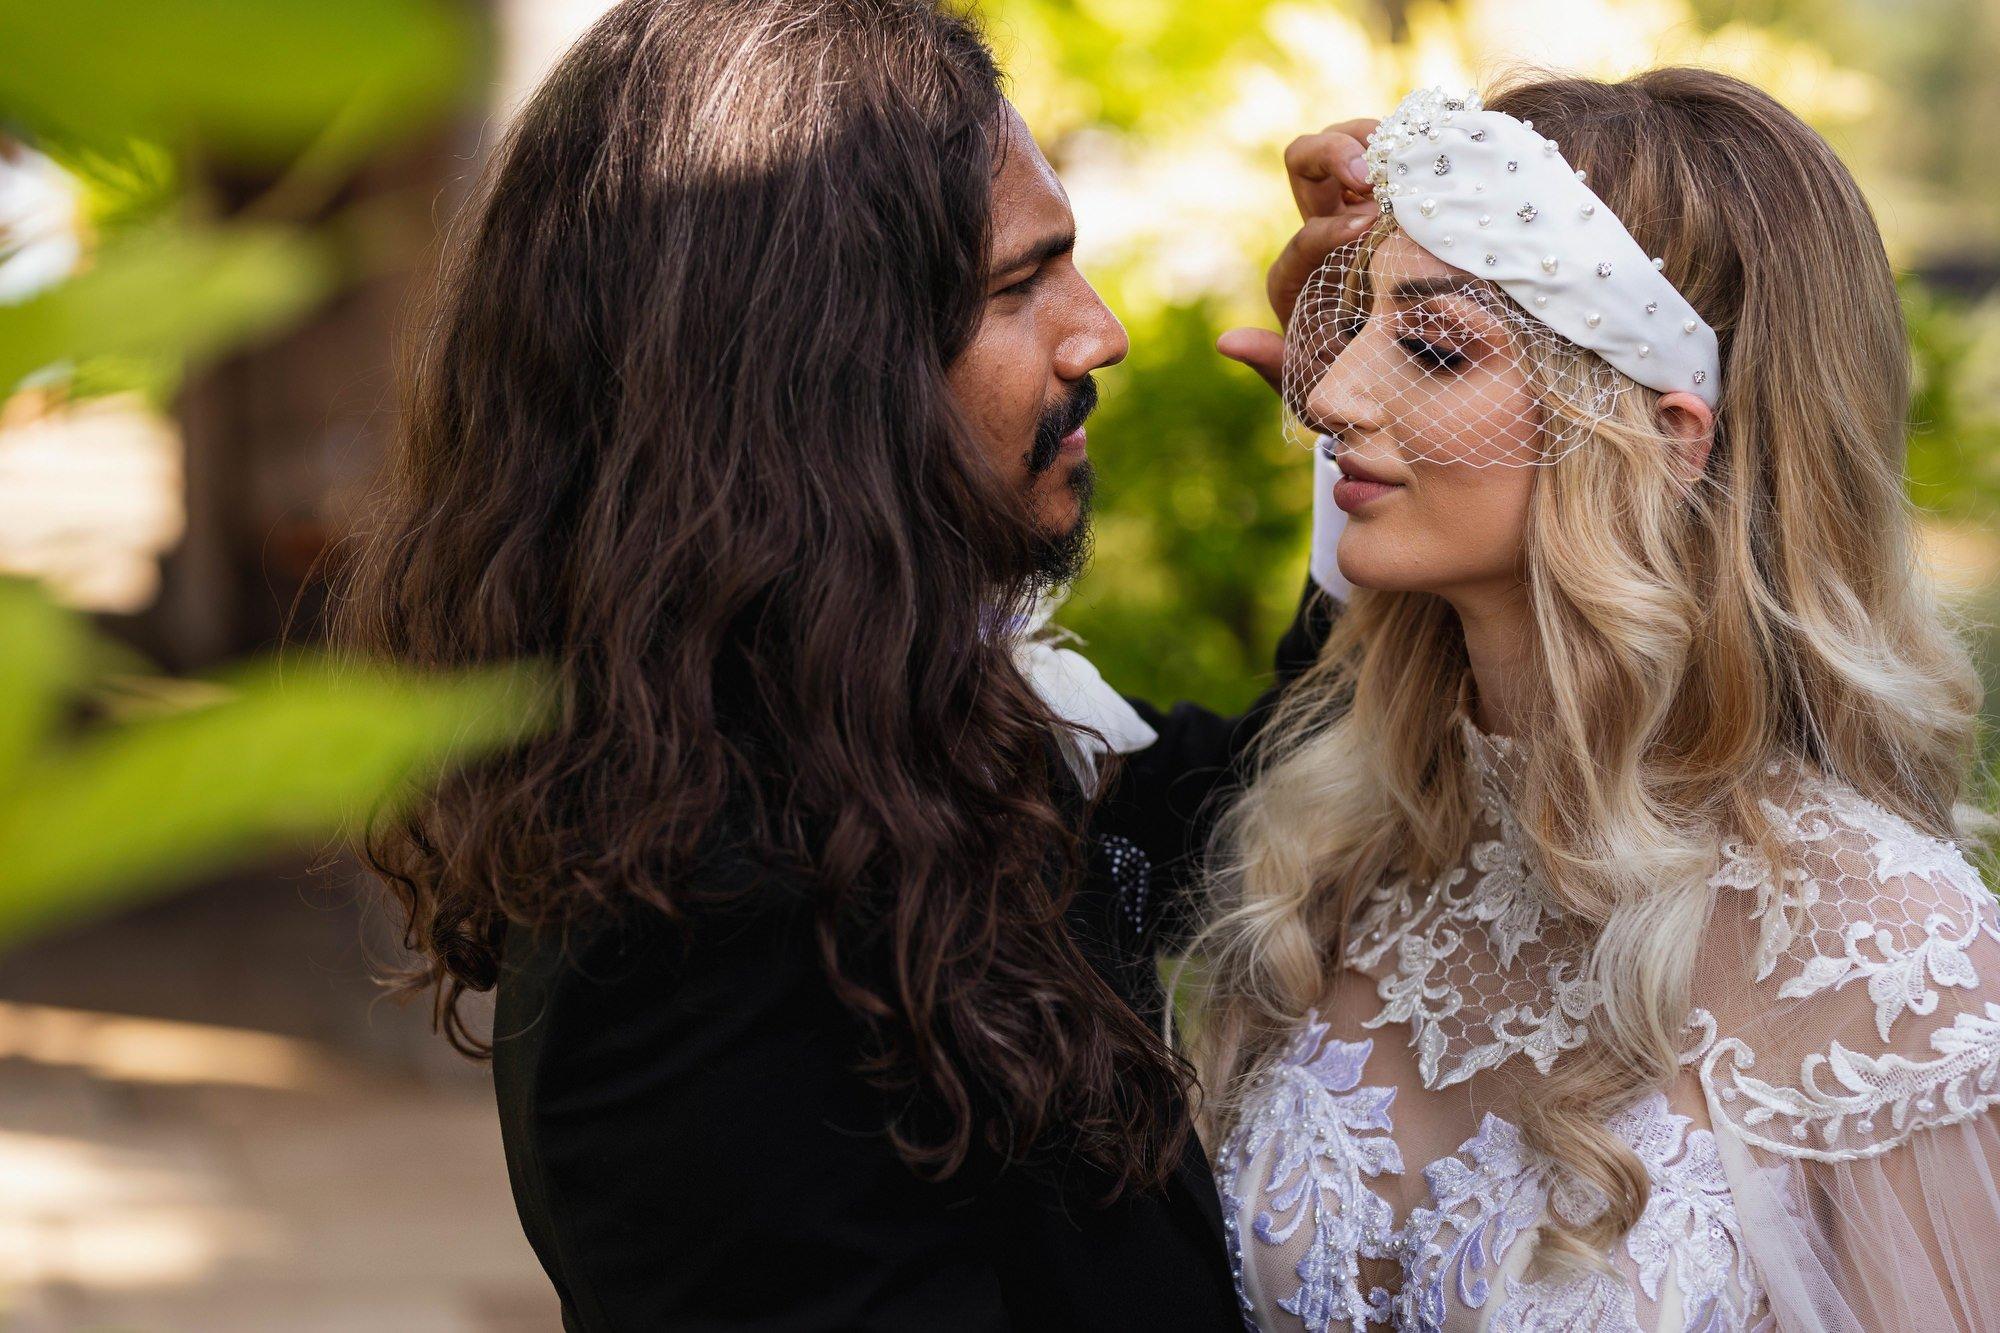 Euridge Manor, Cotswolds, civil ceremony, bride and groom portraits, Cotswolds wedding photographer